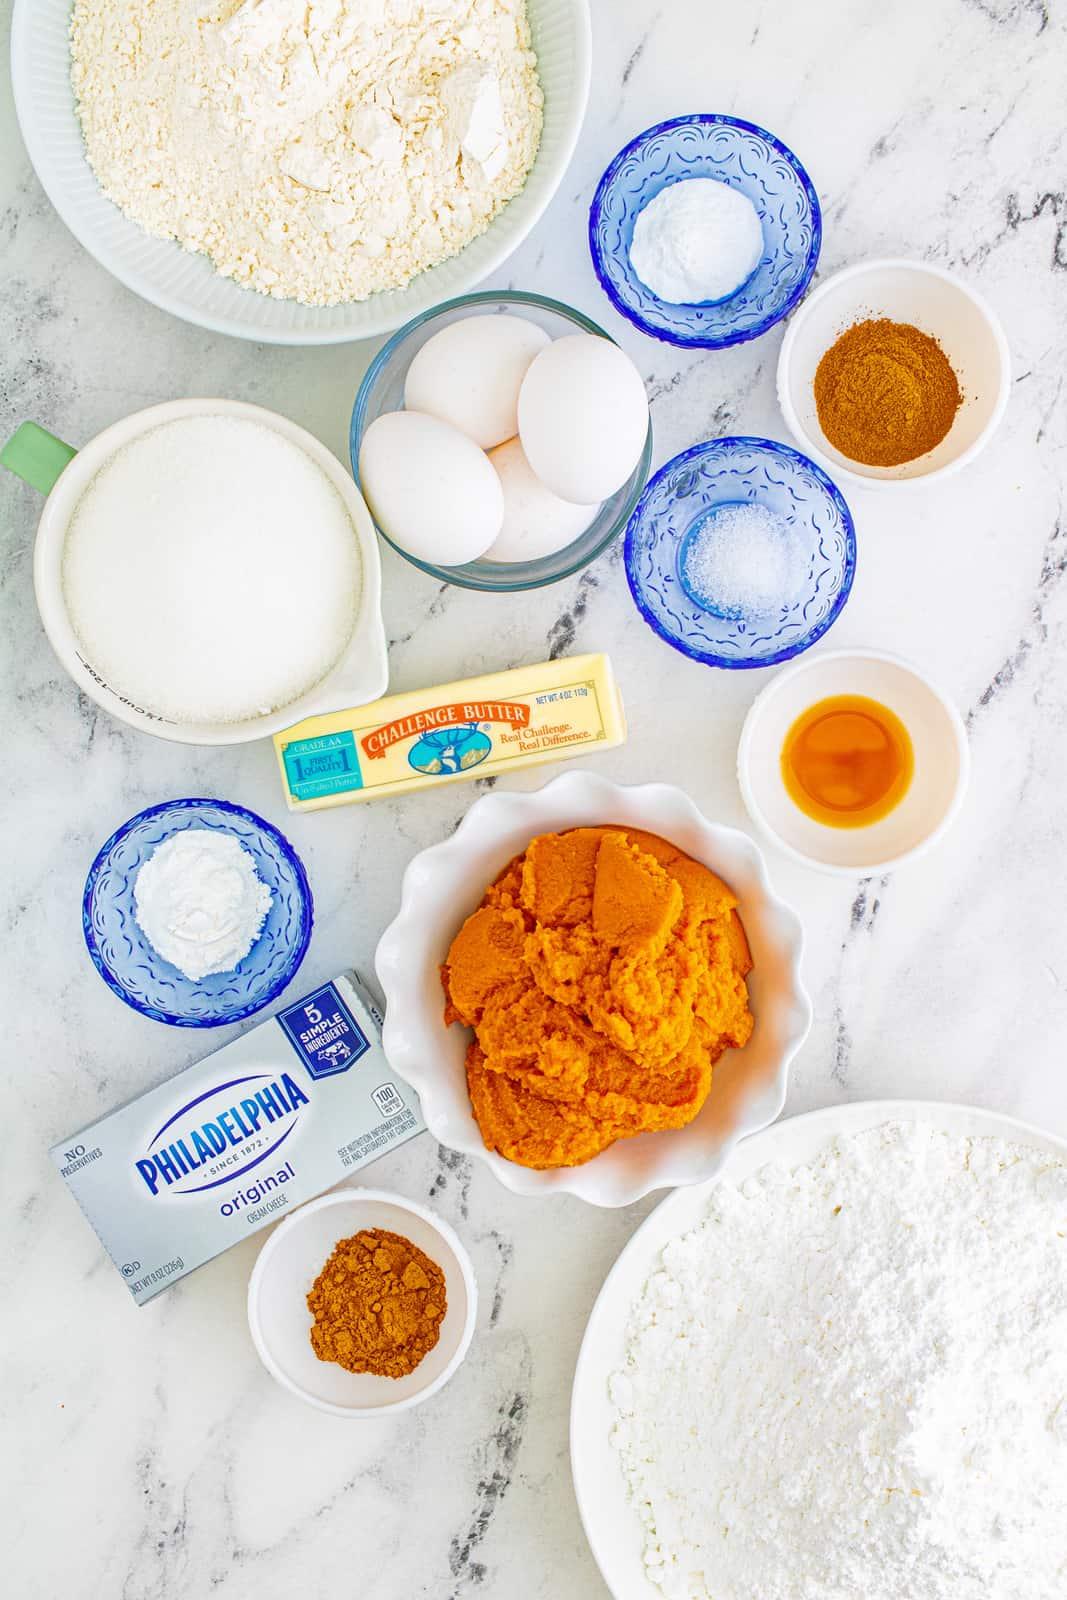 Ingredients needed to make Pumpkin Bars